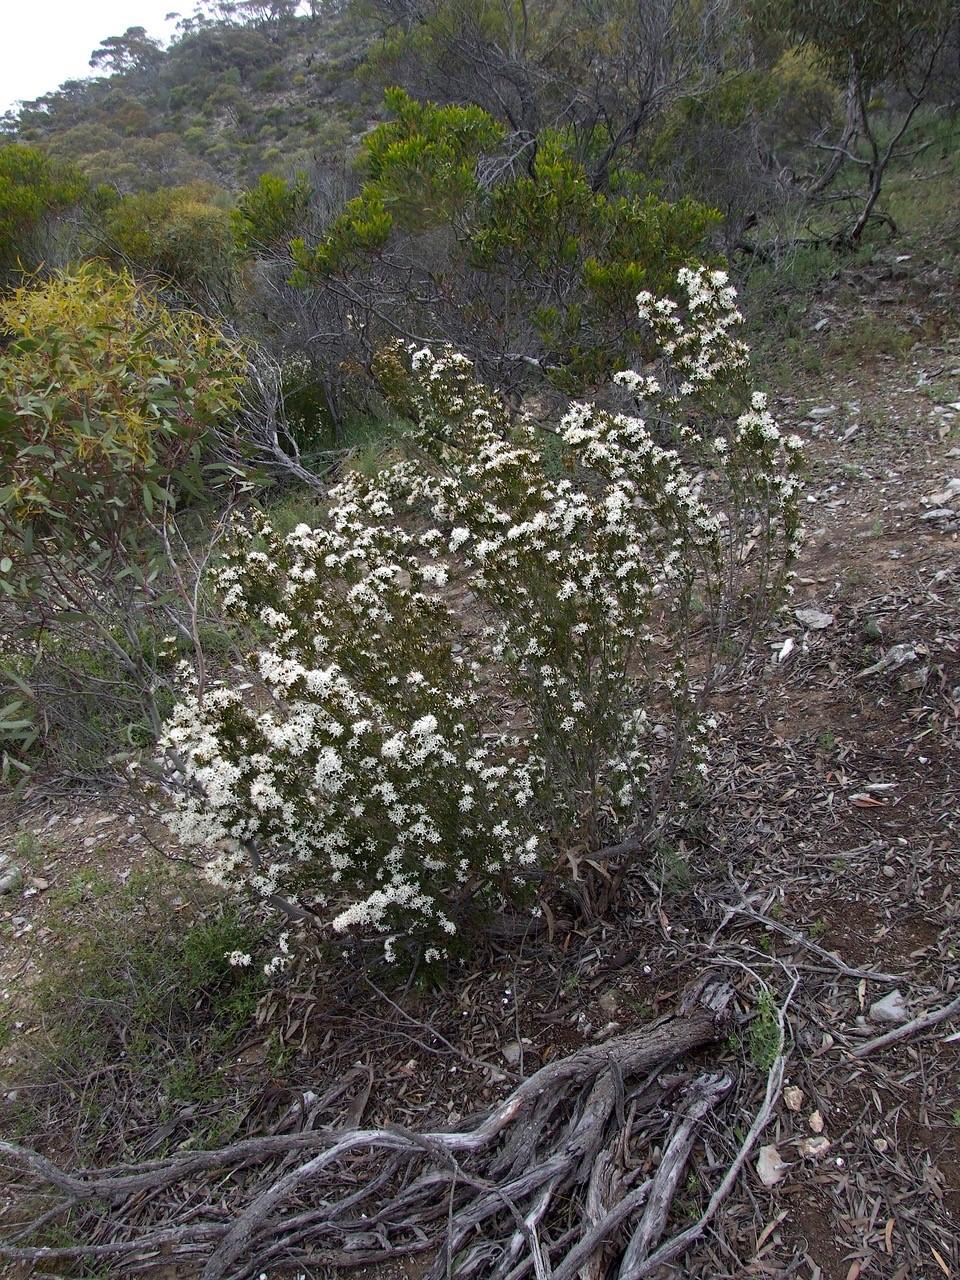 Fringe Myrtle - Calytrix tetragona